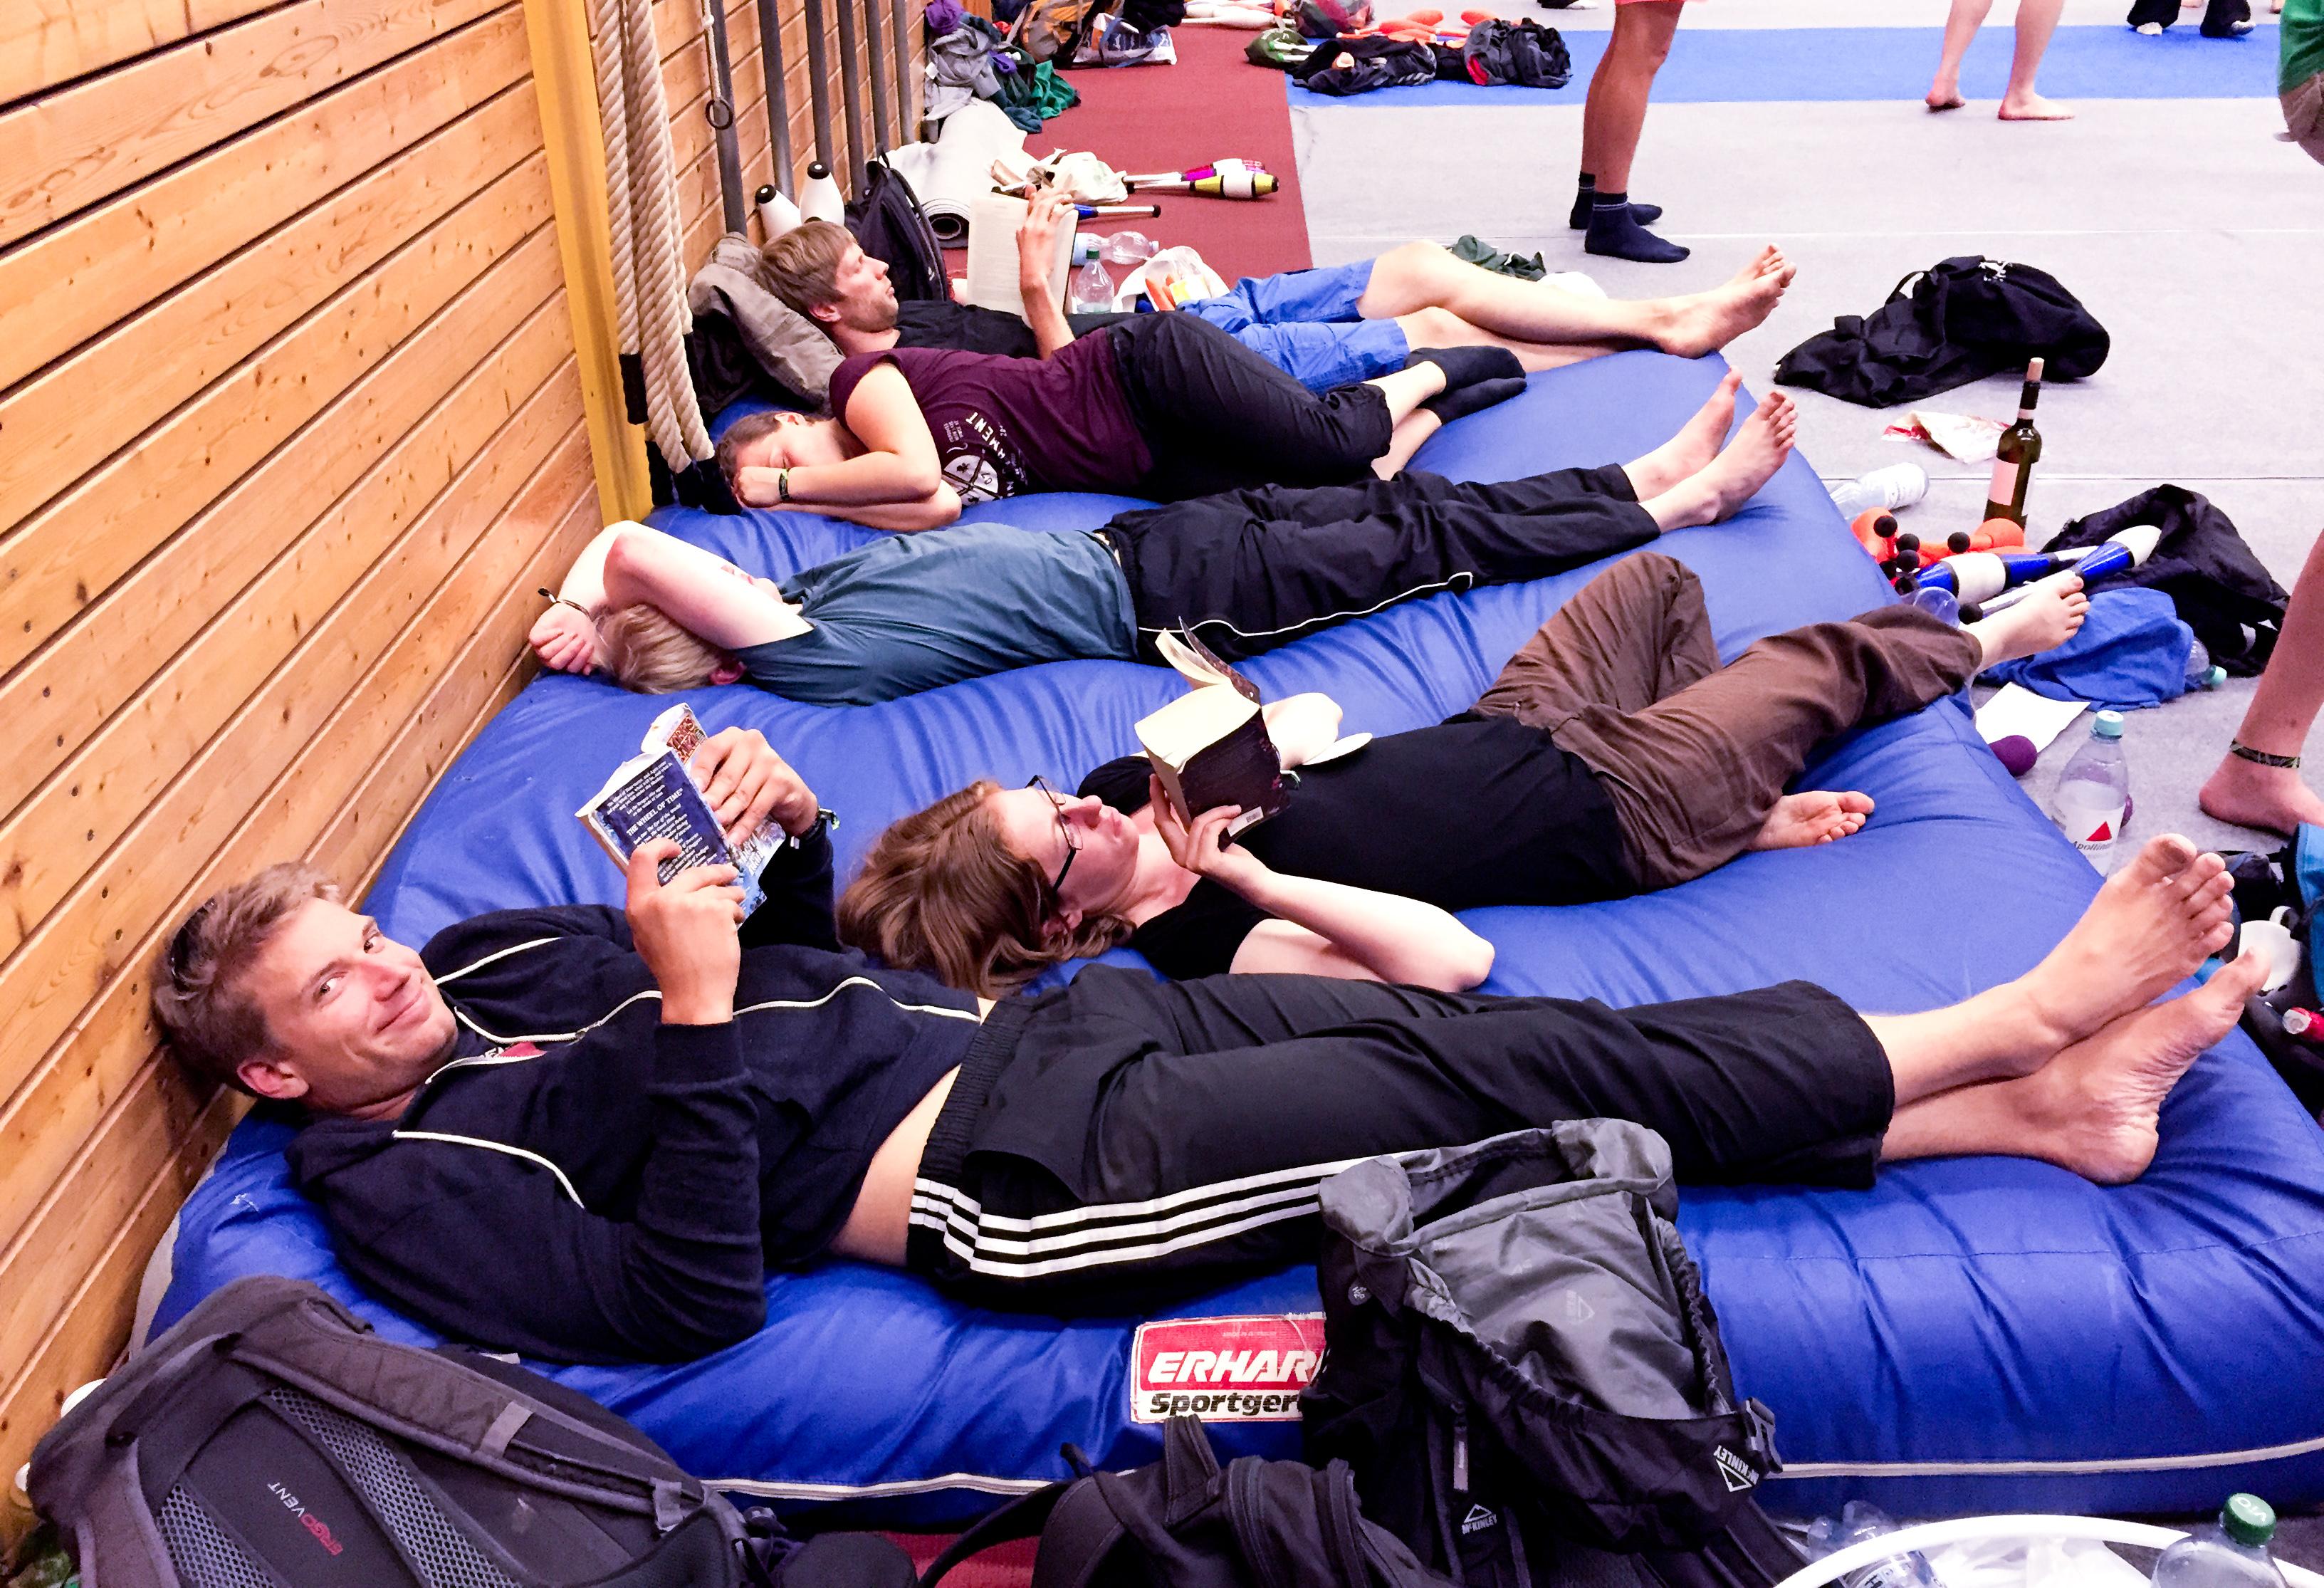 EJC 2015 Bruneck - Sunday August 2nd: Gym 3 Book Club.